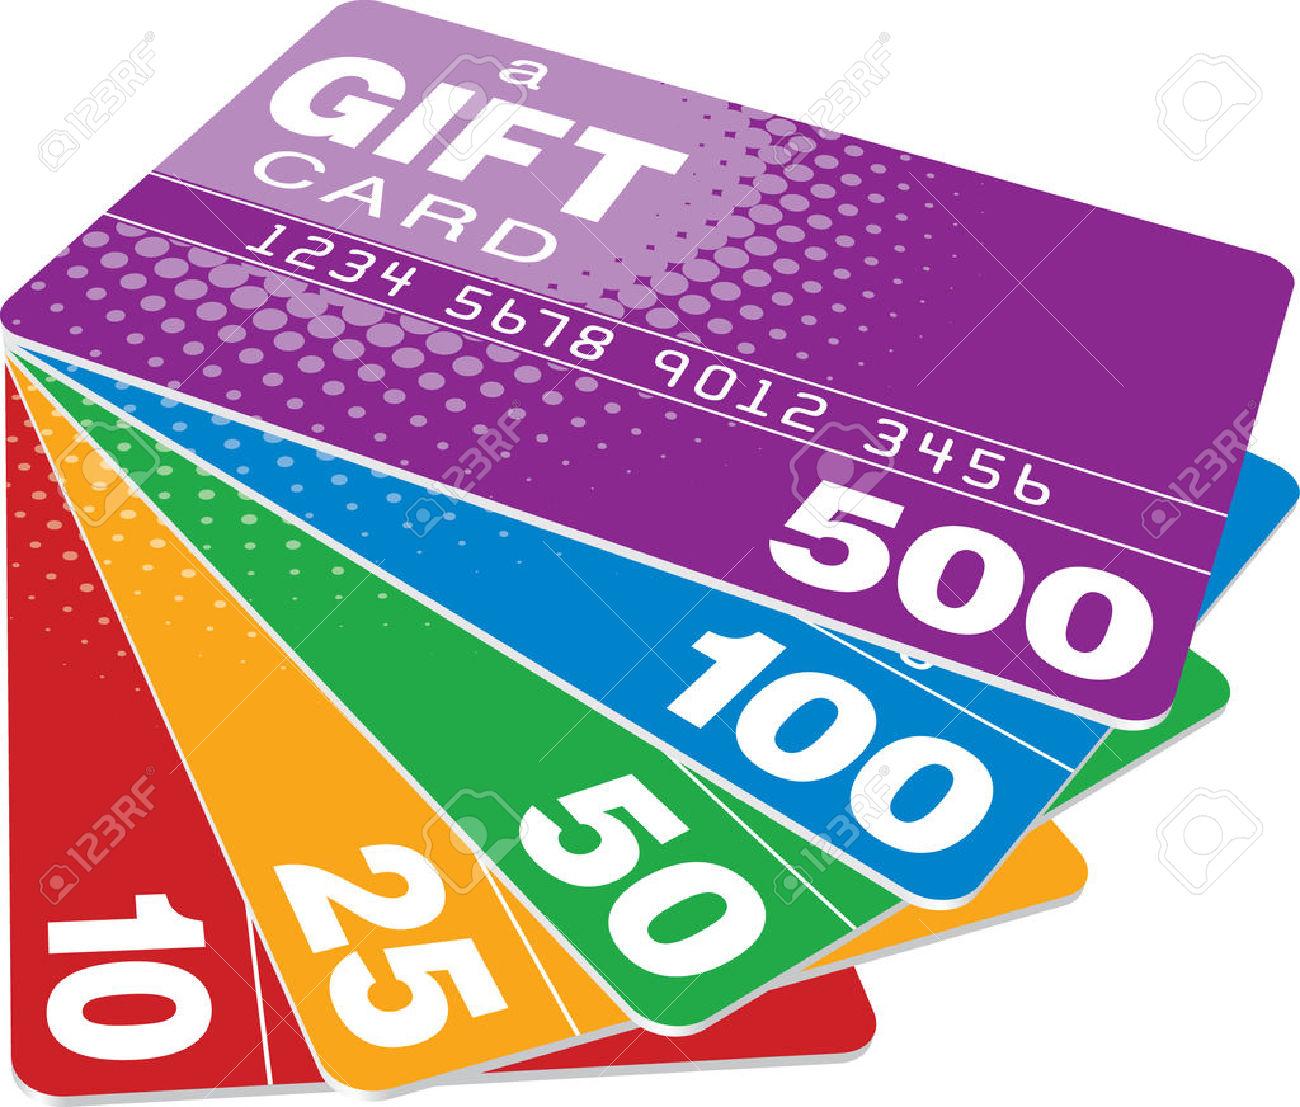 MasterCard Gift Card Clip Art Free